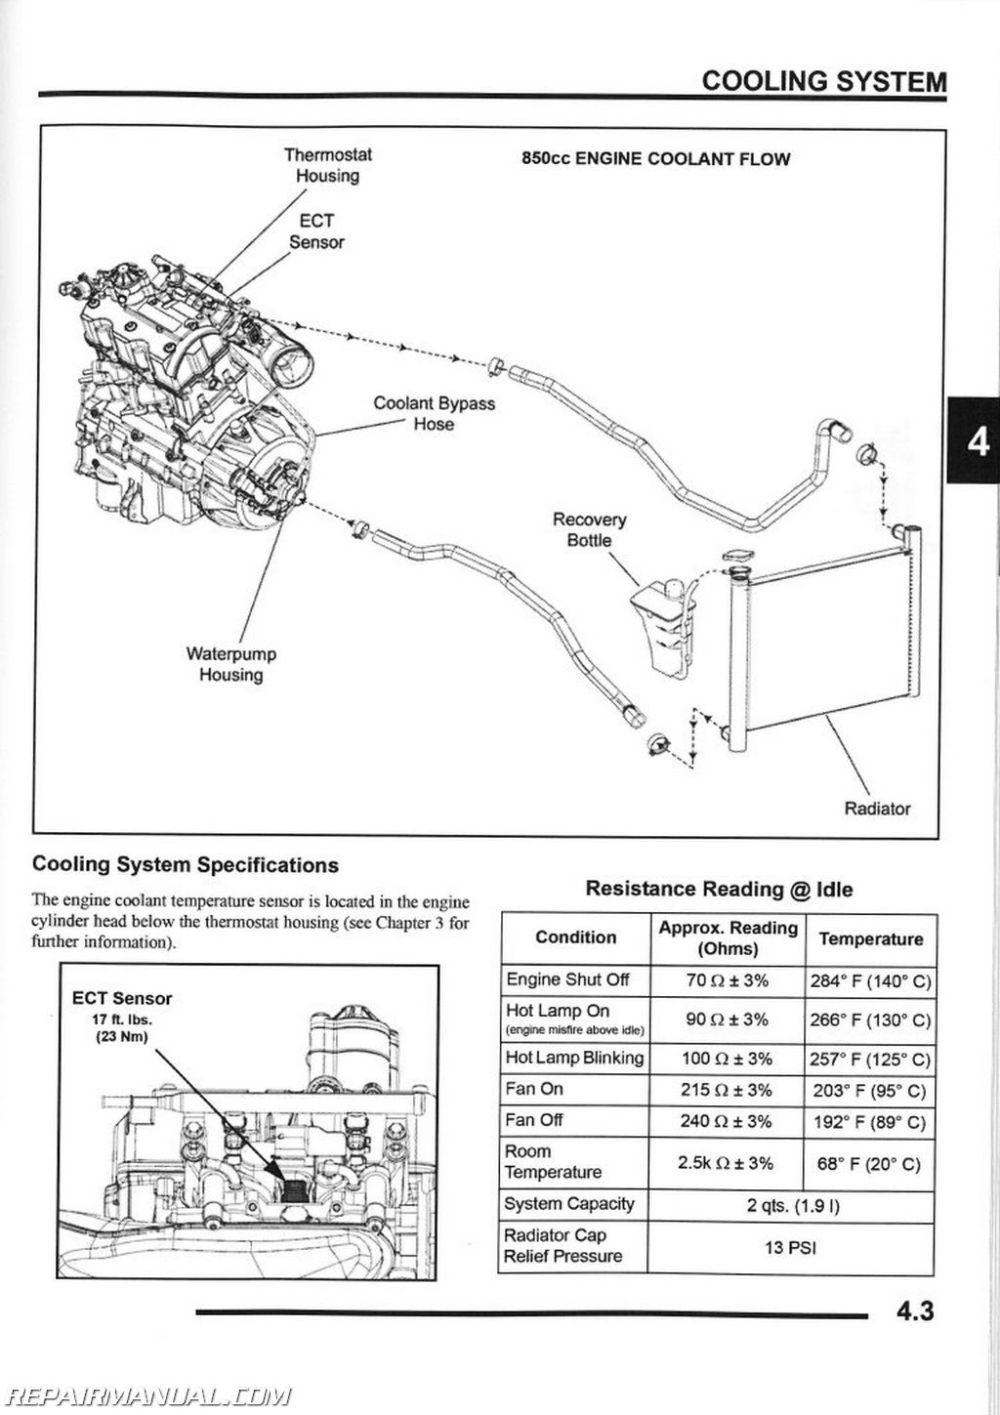 medium resolution of polaris sportsman 850 wiring diagram wiring diagramscrambler 850 wiring diagram wiring diagramscrambler 850 wiring diagram online